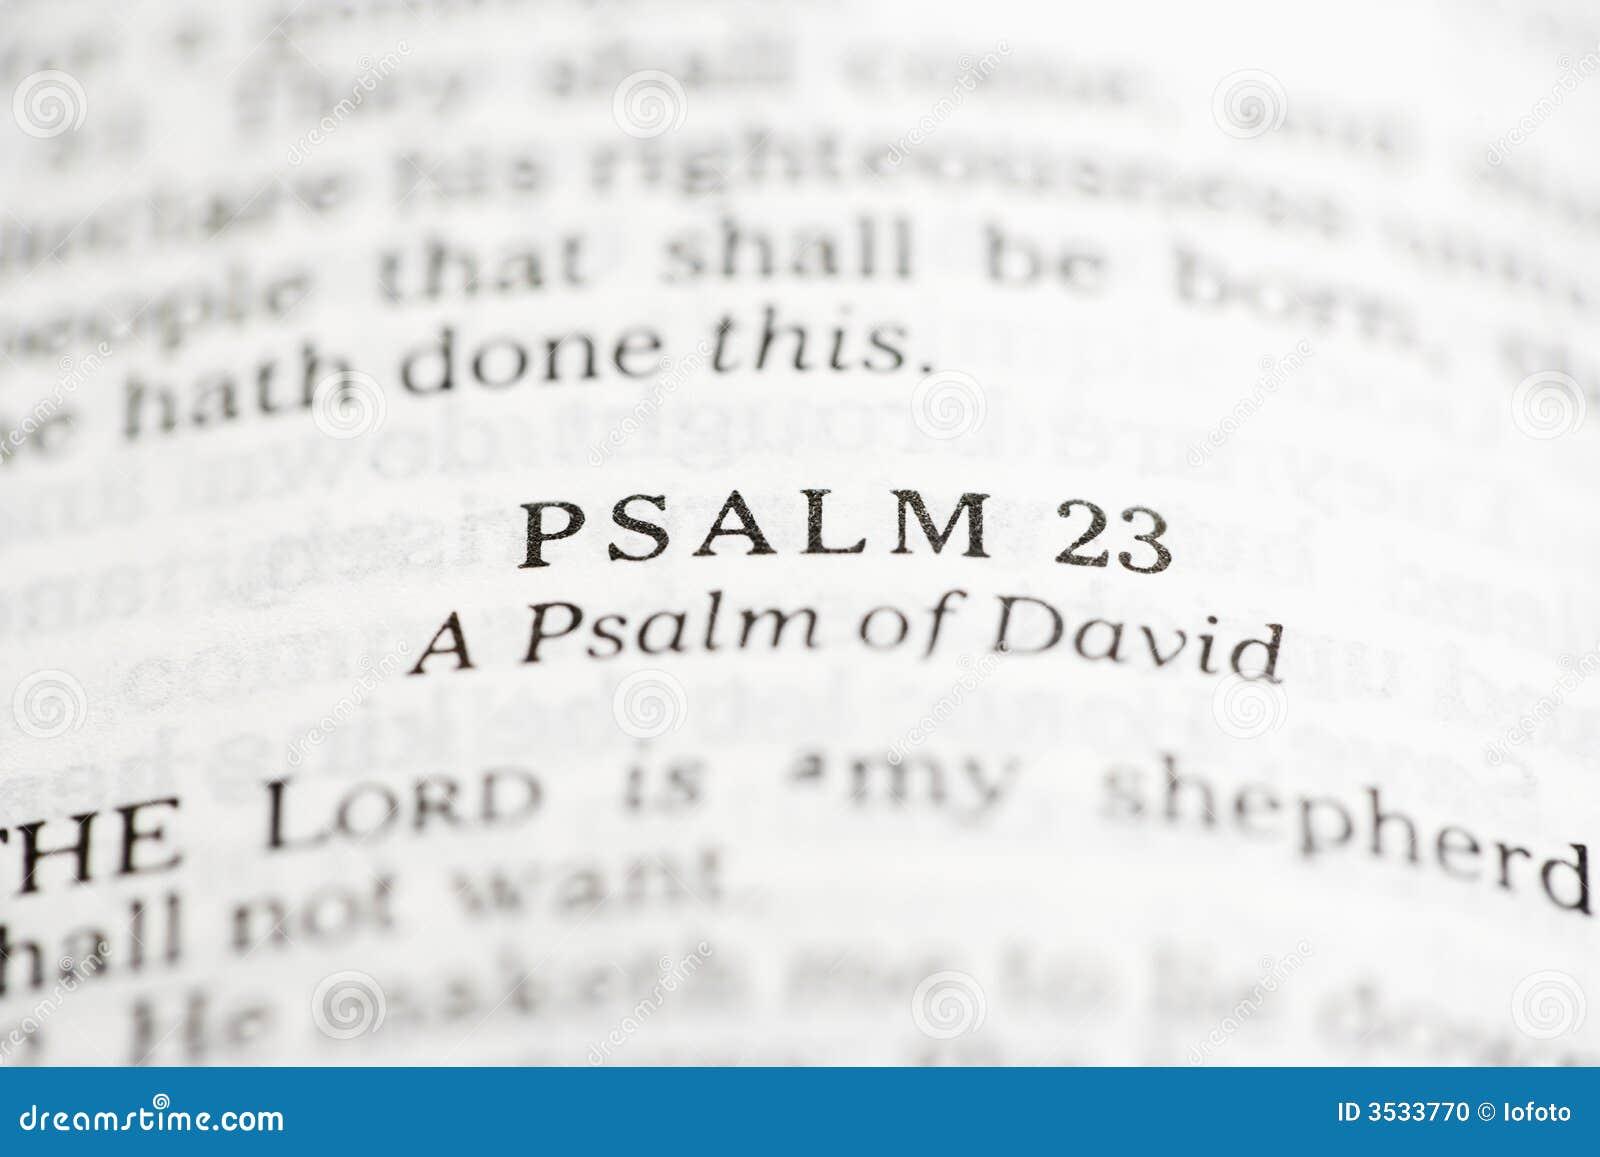 David psalm